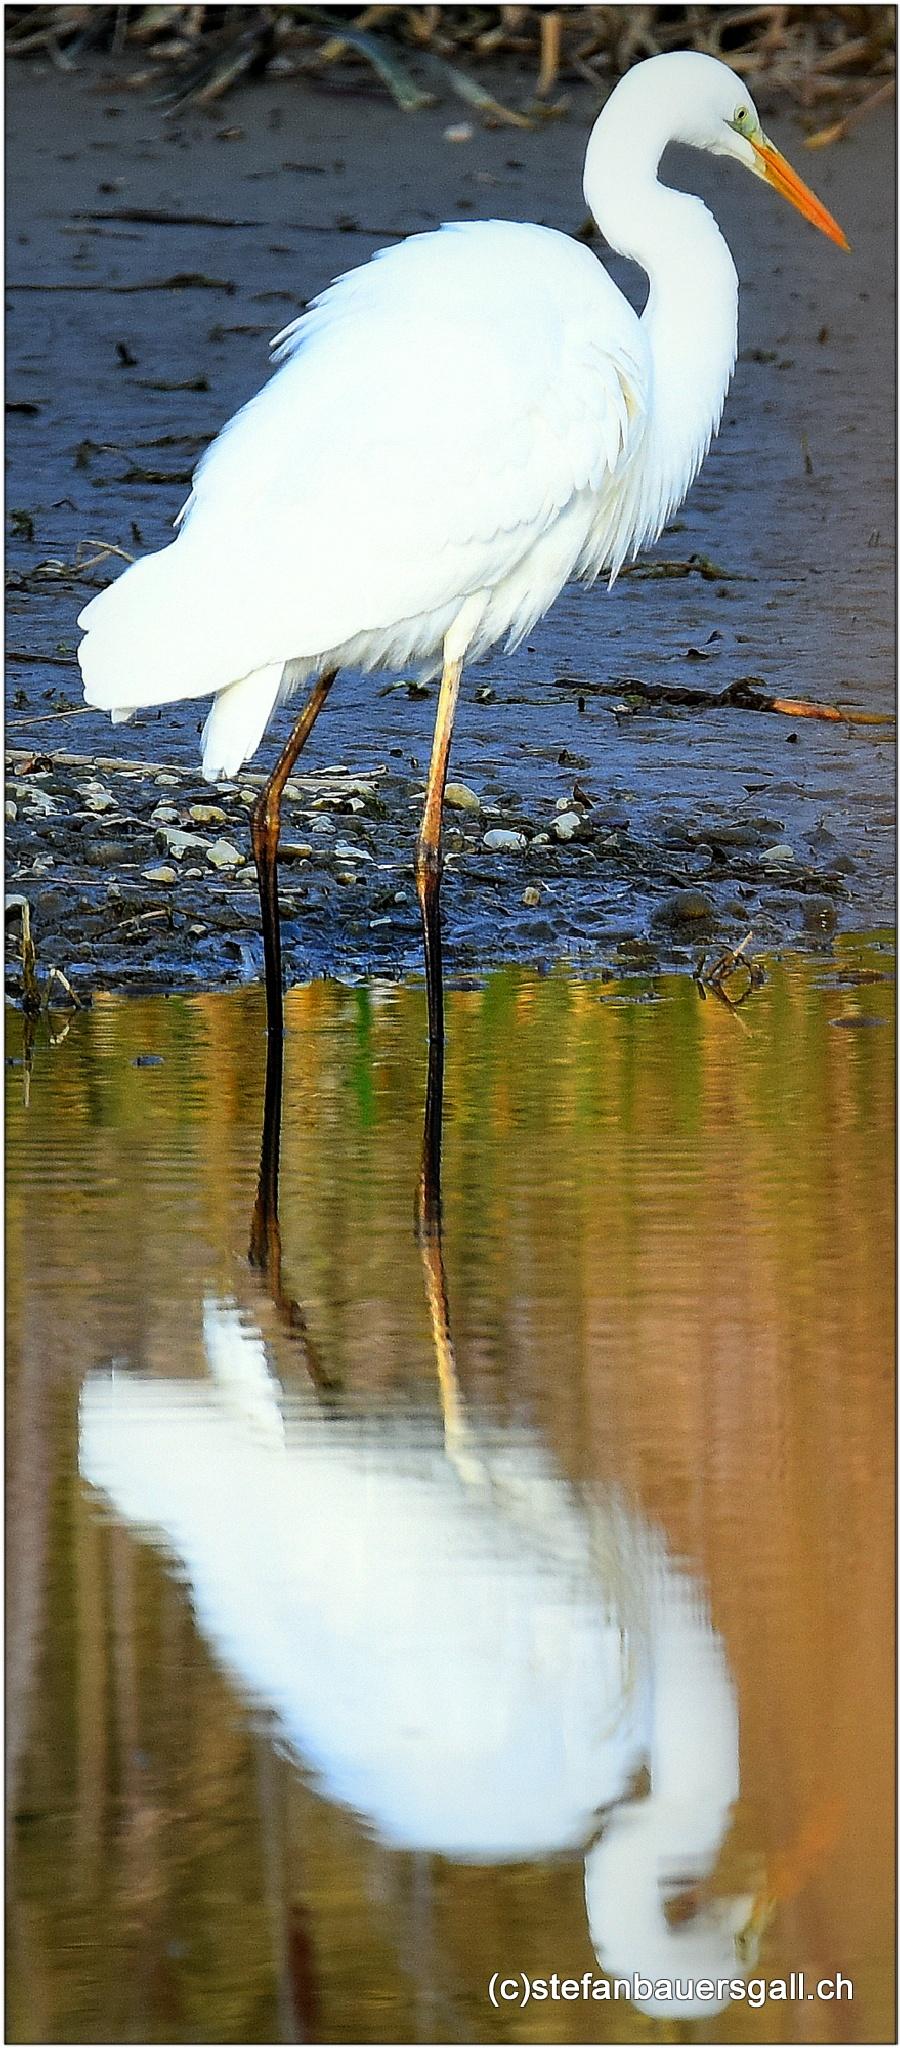 """silver heron"" by BauerStefan"